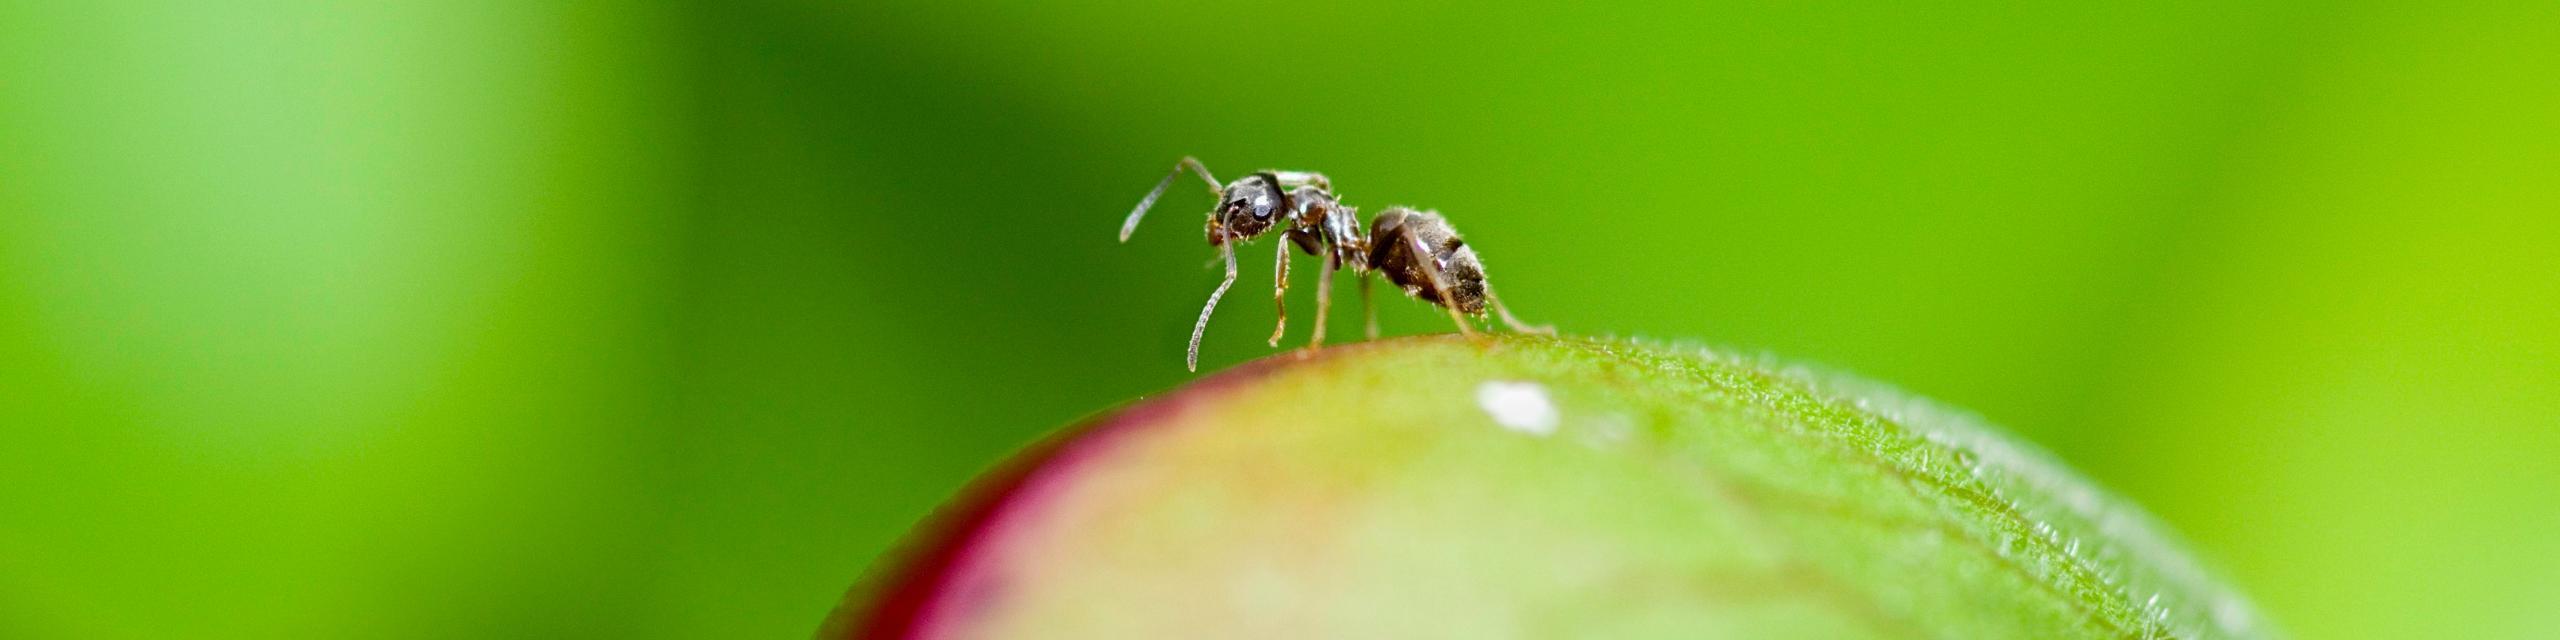 Humboldt Termite and Pest Control - Proactive Preventative Pest Protection